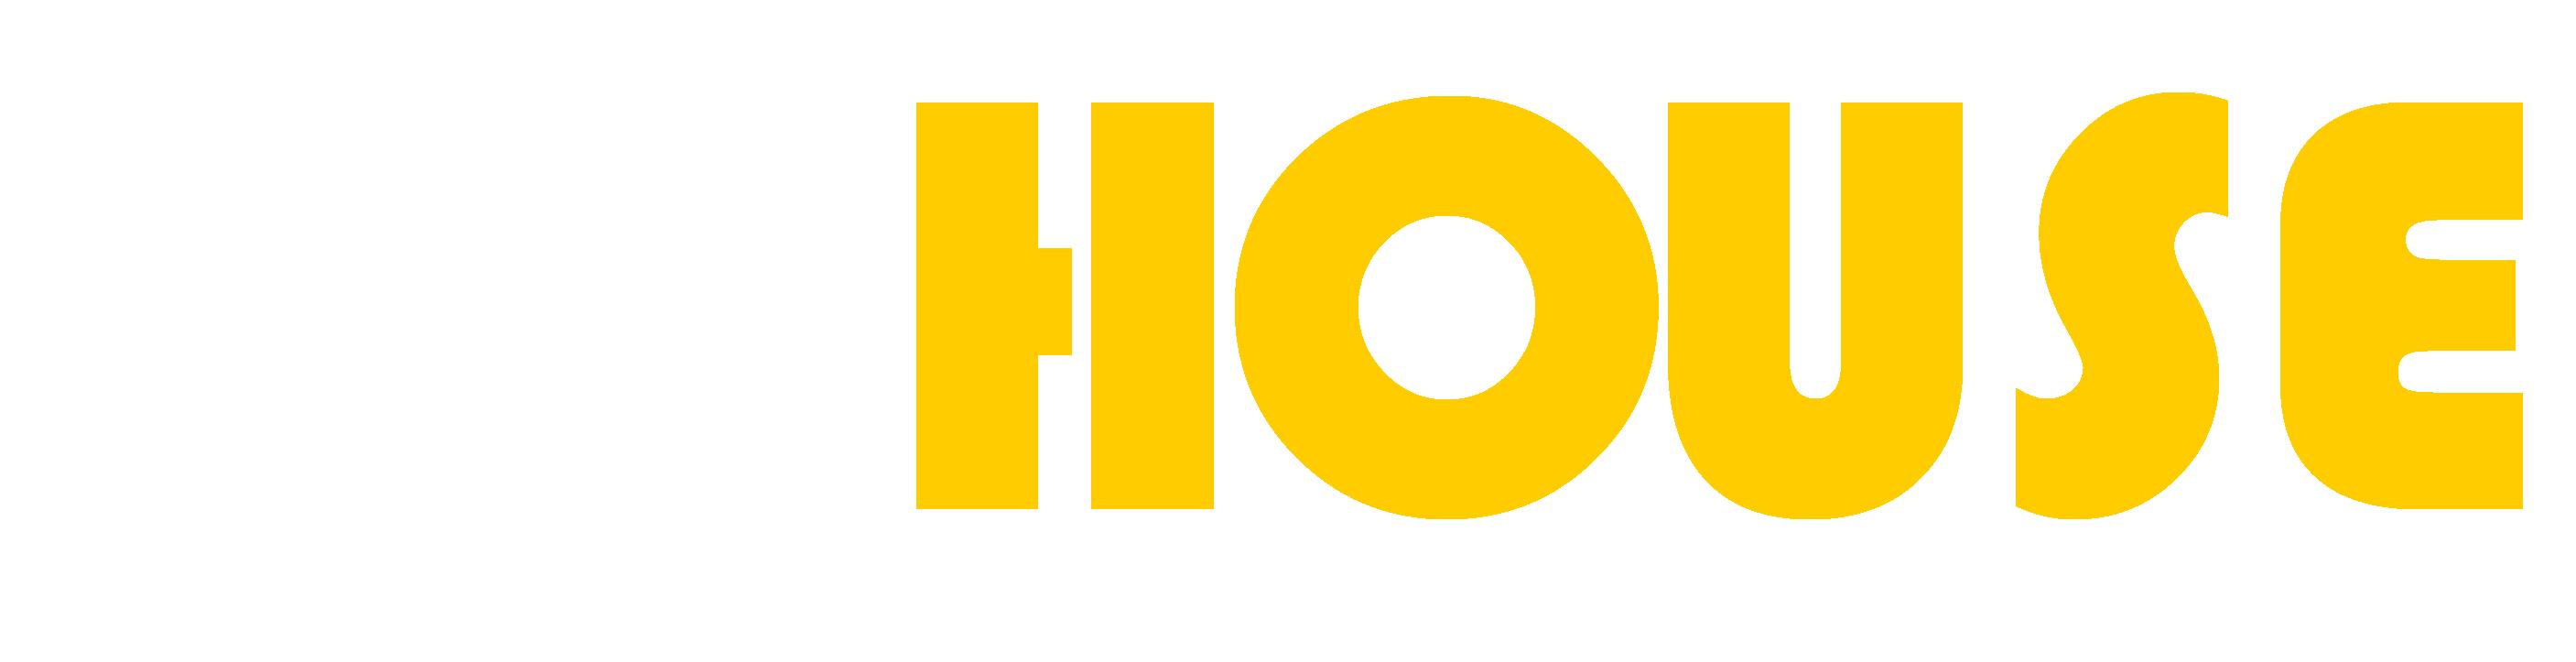 UTIHOUSE